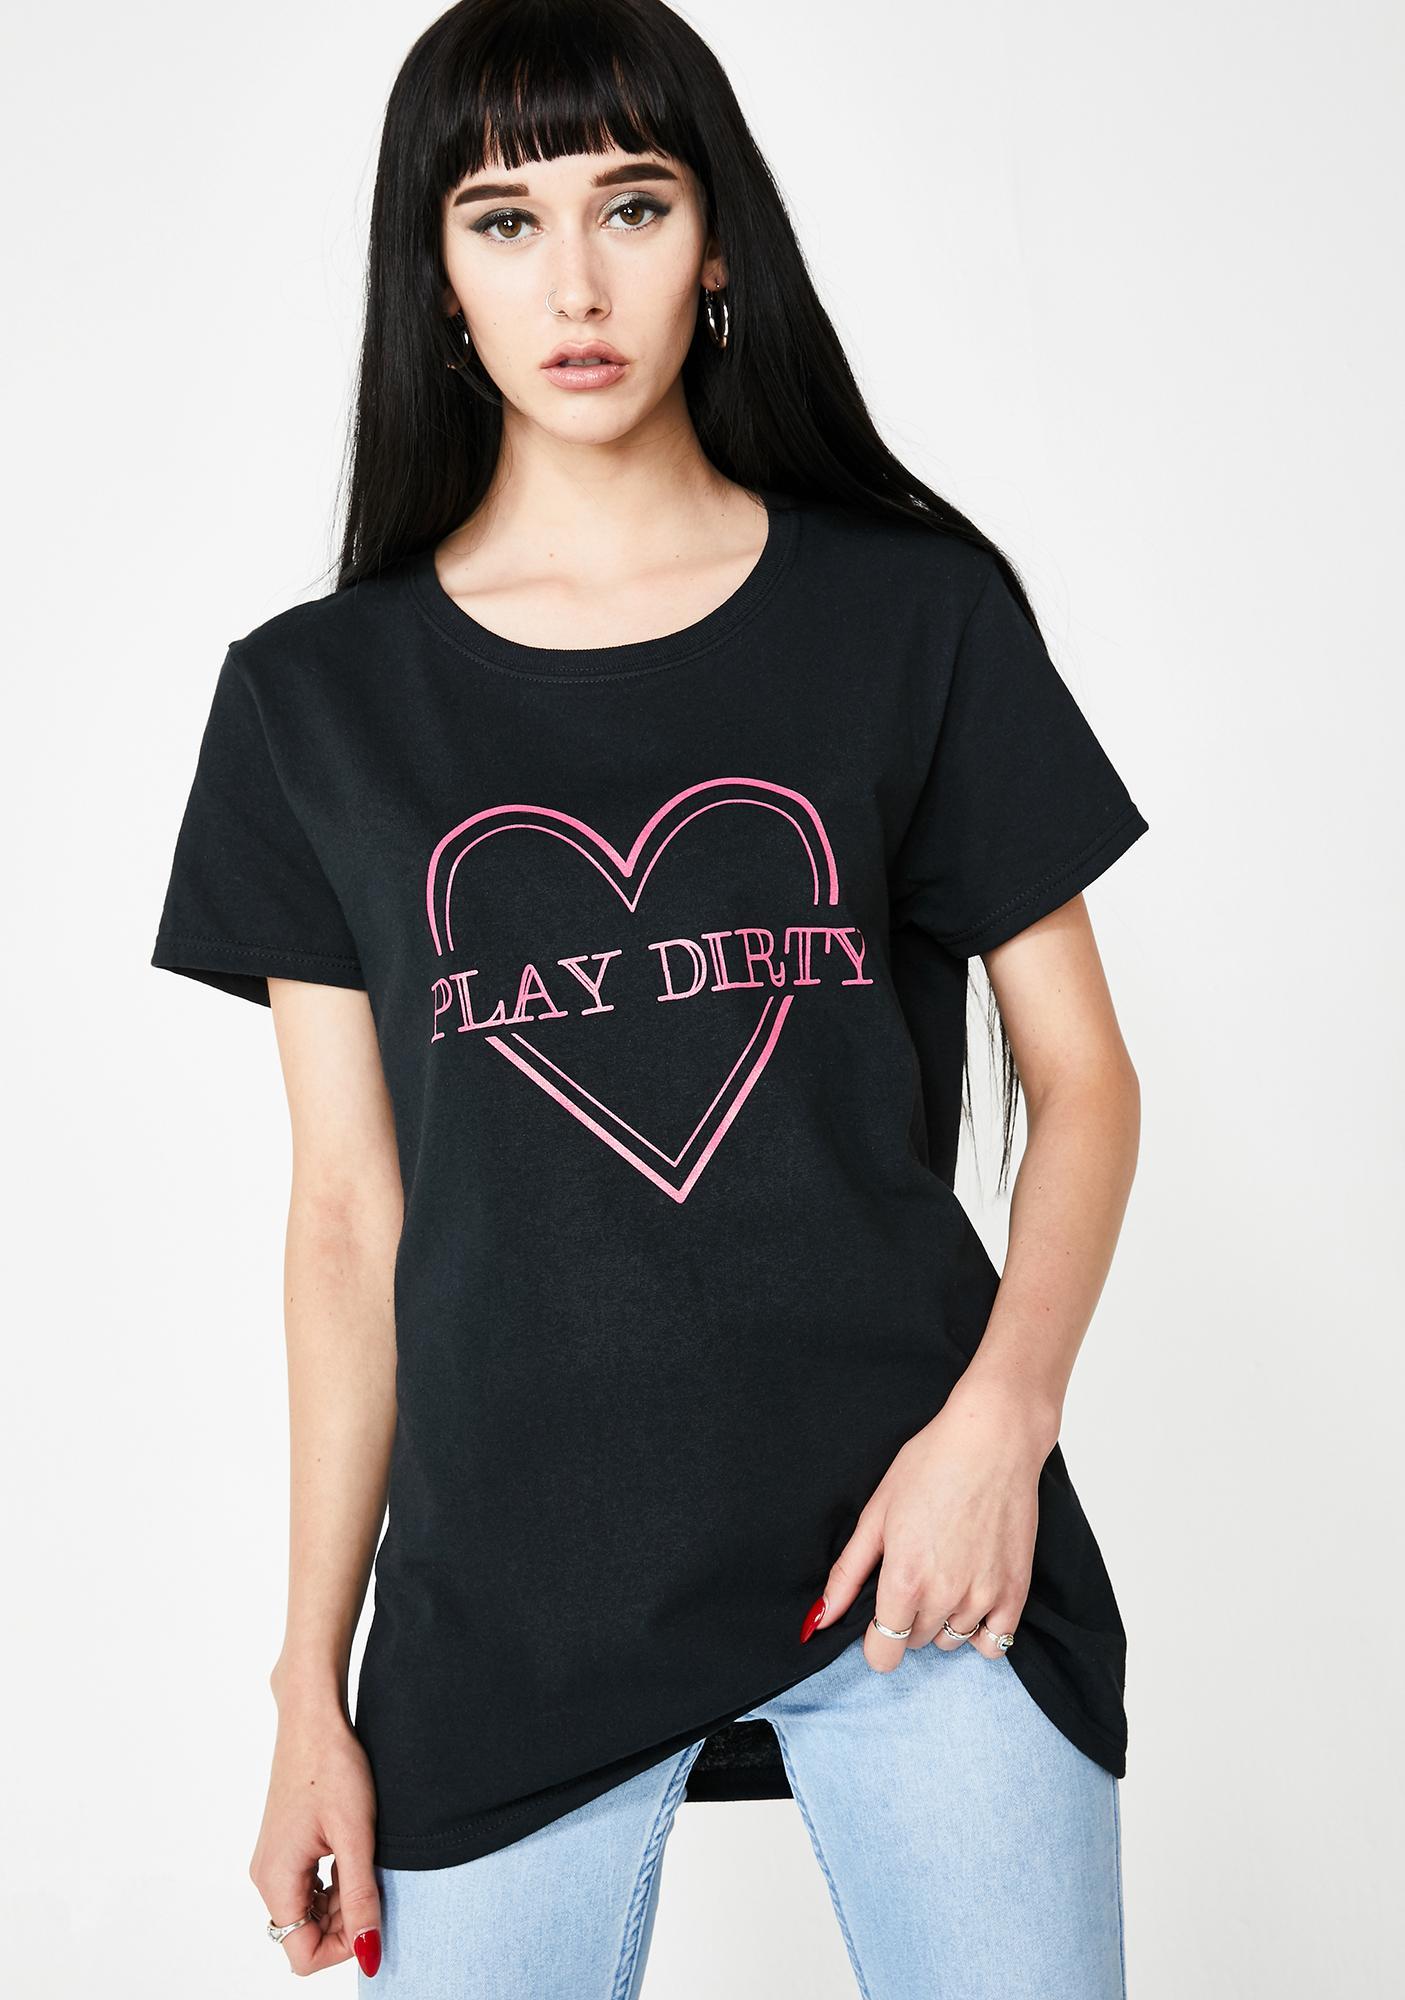 Daisy Street Play Dirty Graphic Tee